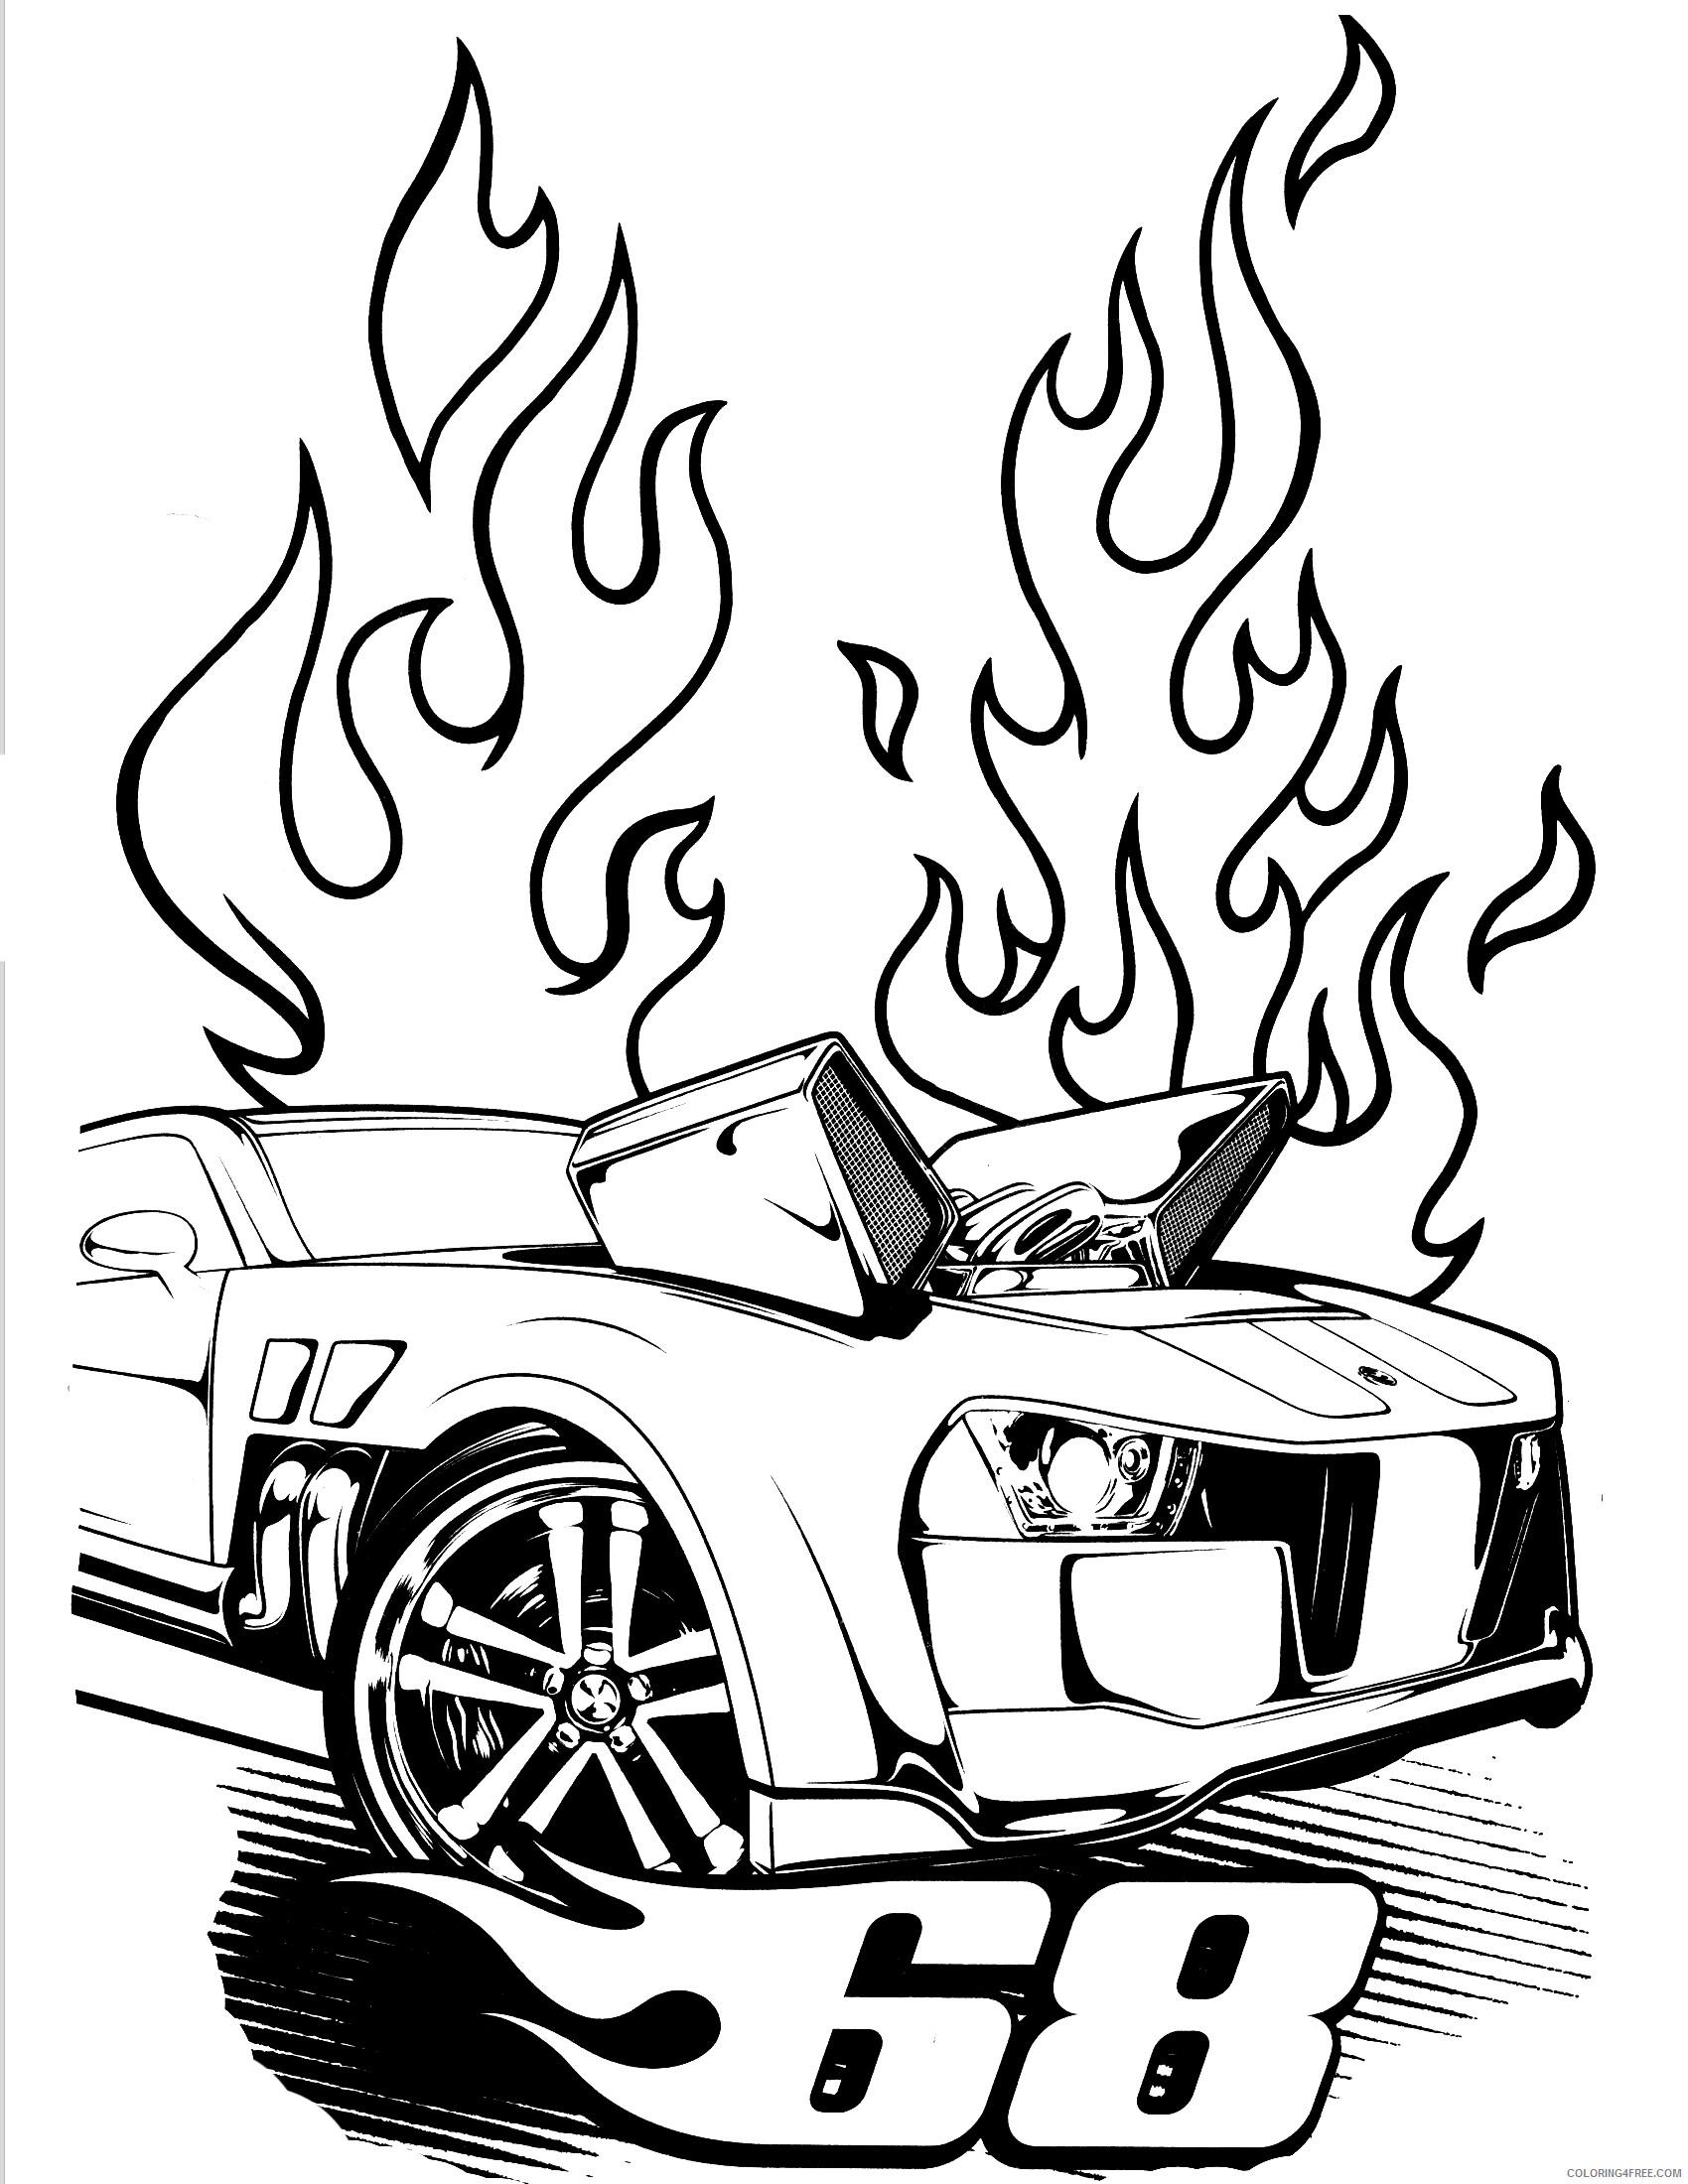 Hot Wheels Coloring Pages Hot Wheels Sheets Printable 2021 3449 Coloring4free